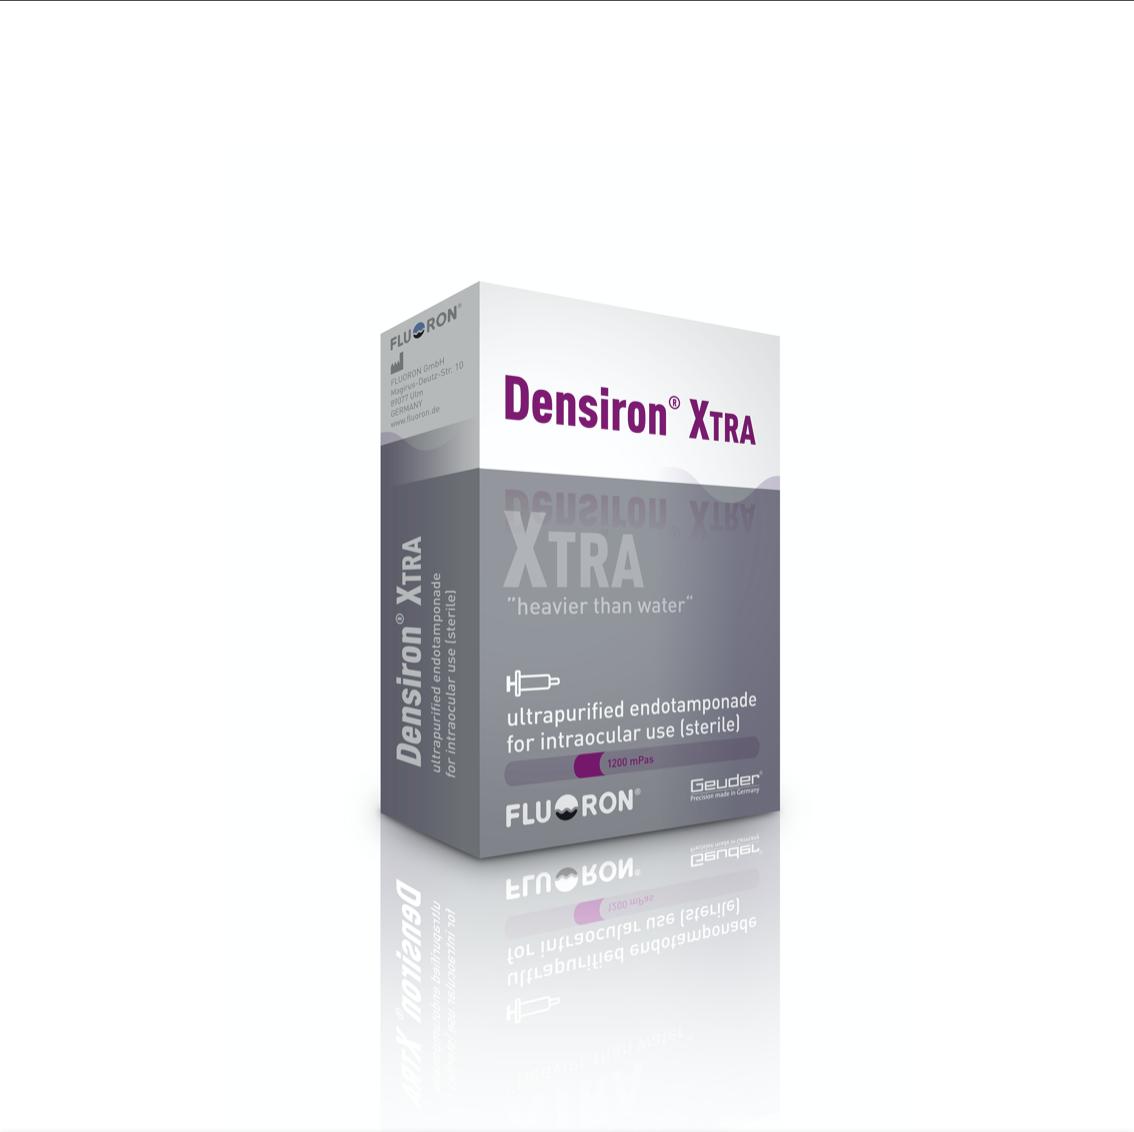 Densiron® XTRA